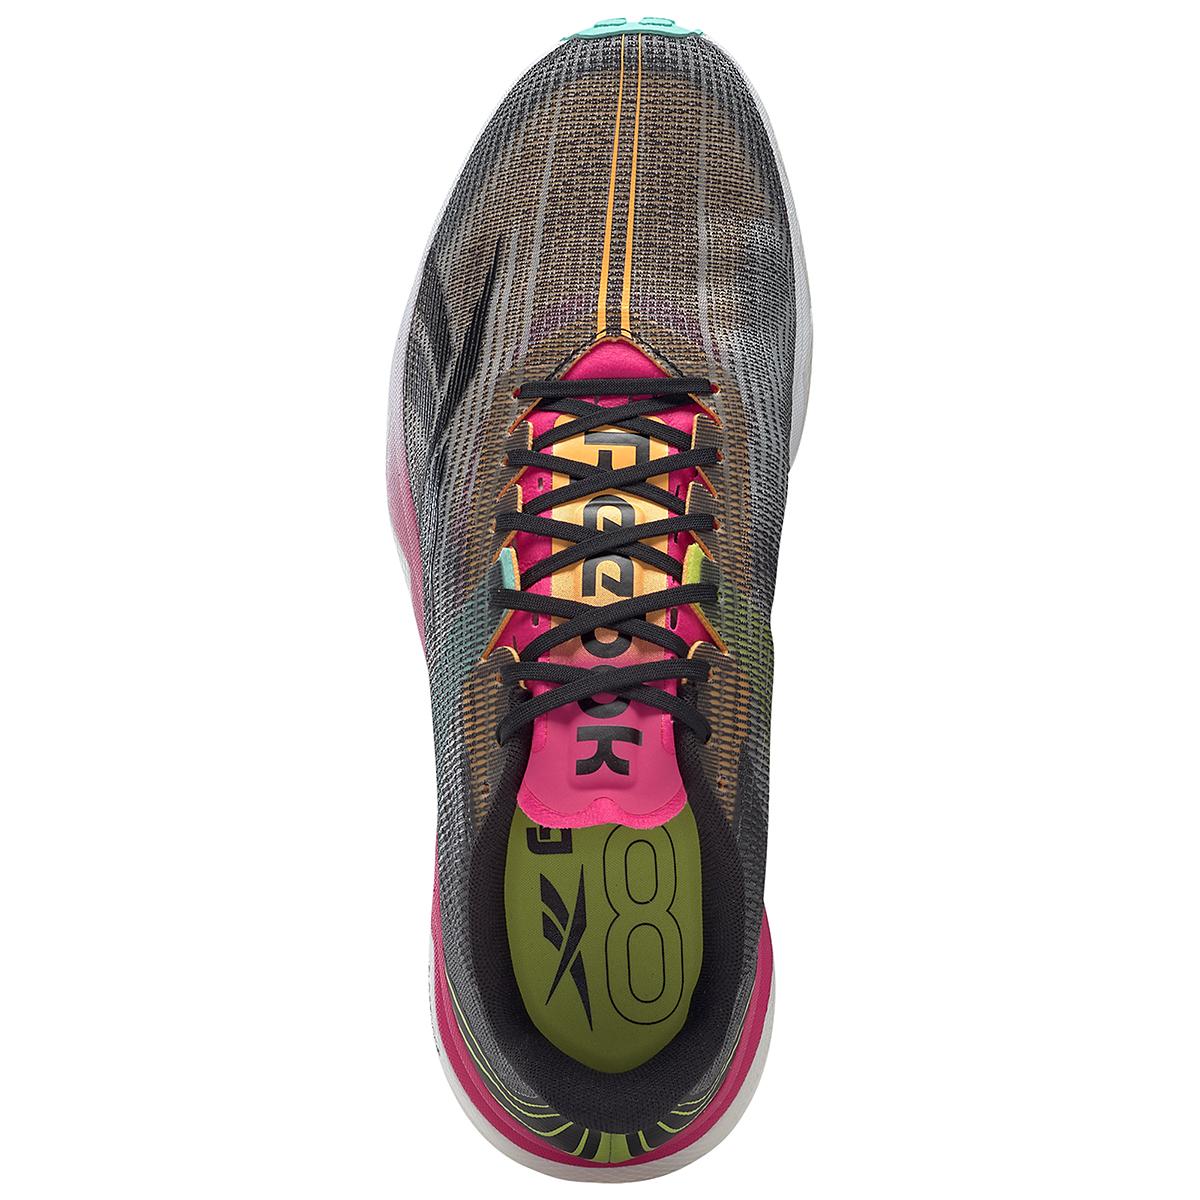 Men's Reebok Floatride Run Fast 3.0 Running Shoe - Color: Black/Purple Pink - Size: 7 - Width: Regular, Black/Purple Pink, large, image 3